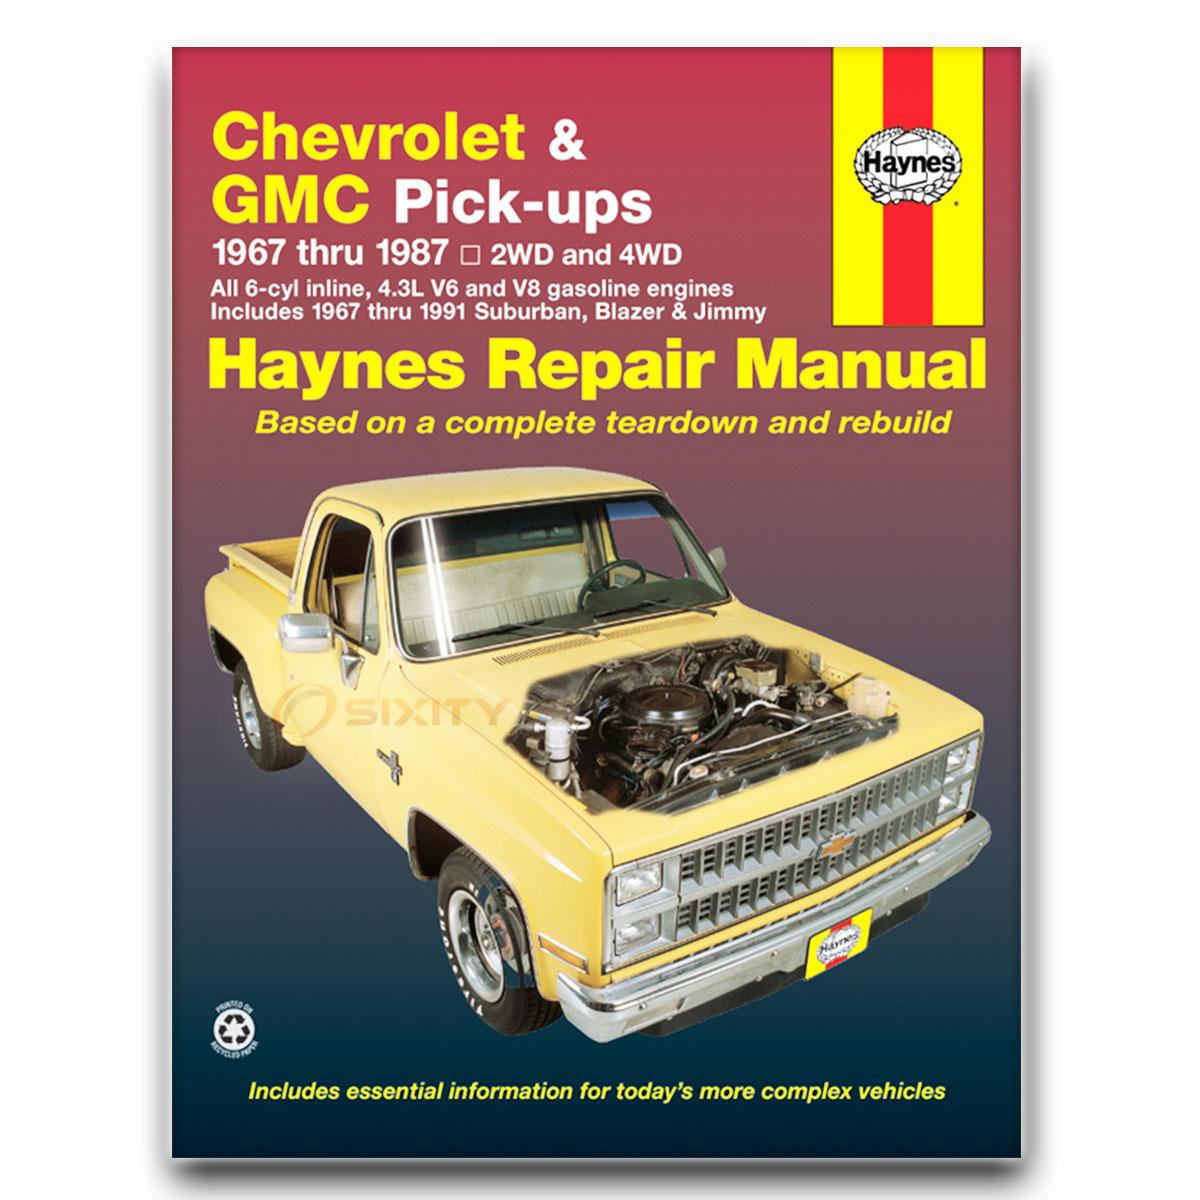 chevy c10 pickup haynes repair manual base shop service garage book rh ebay com chevrolet service manual chevrolet spark maintenance manual